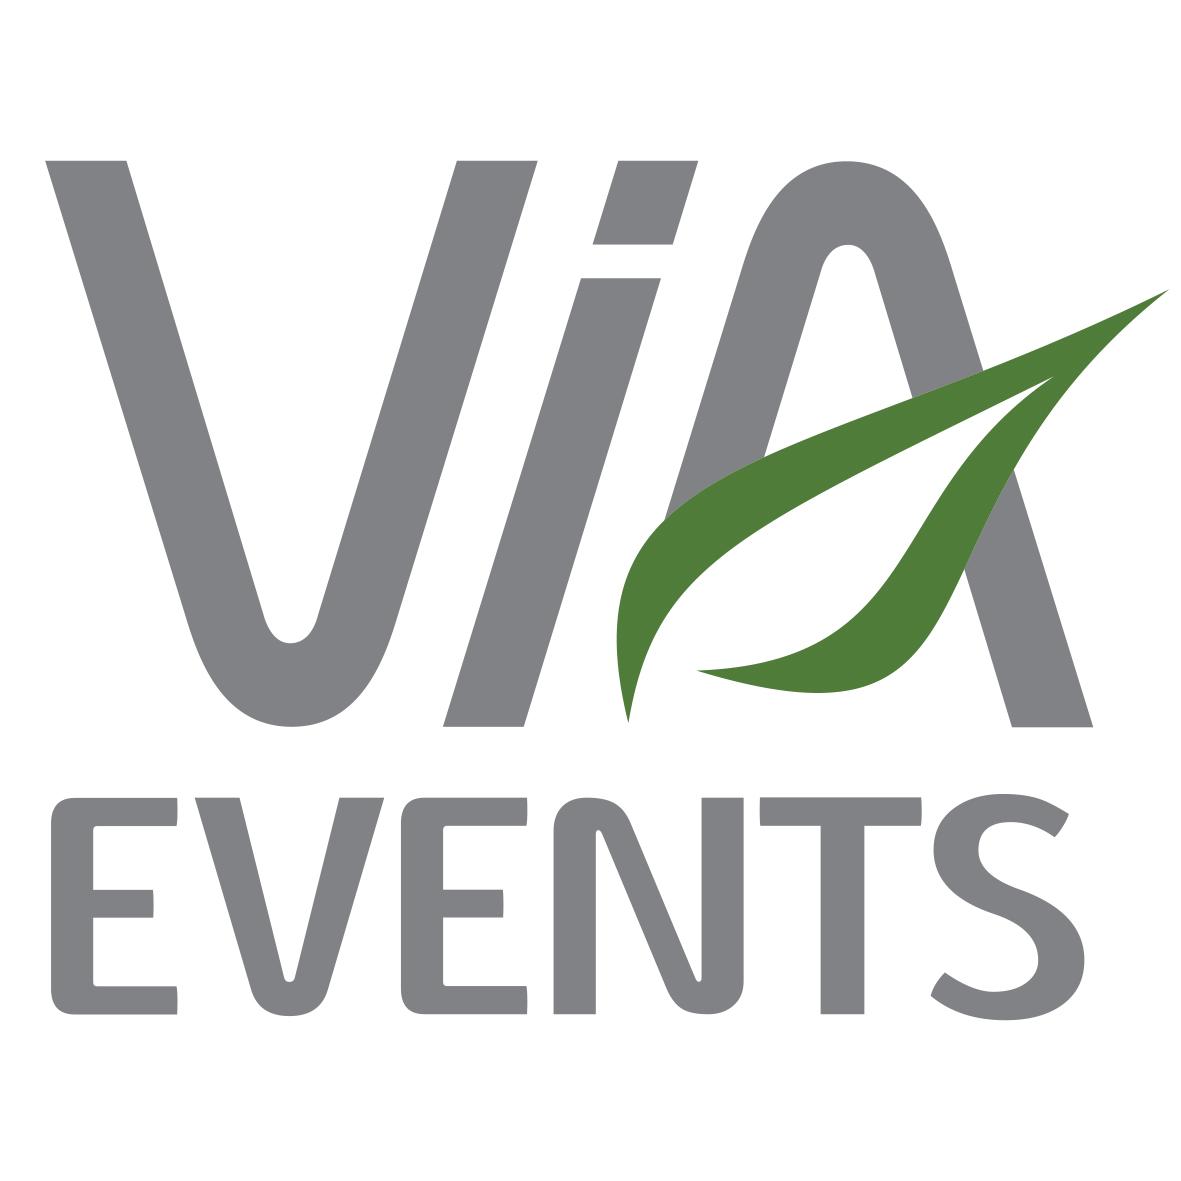 WedReviews - מקום לאירוע - ויה אירועים | VIA  EVENTS